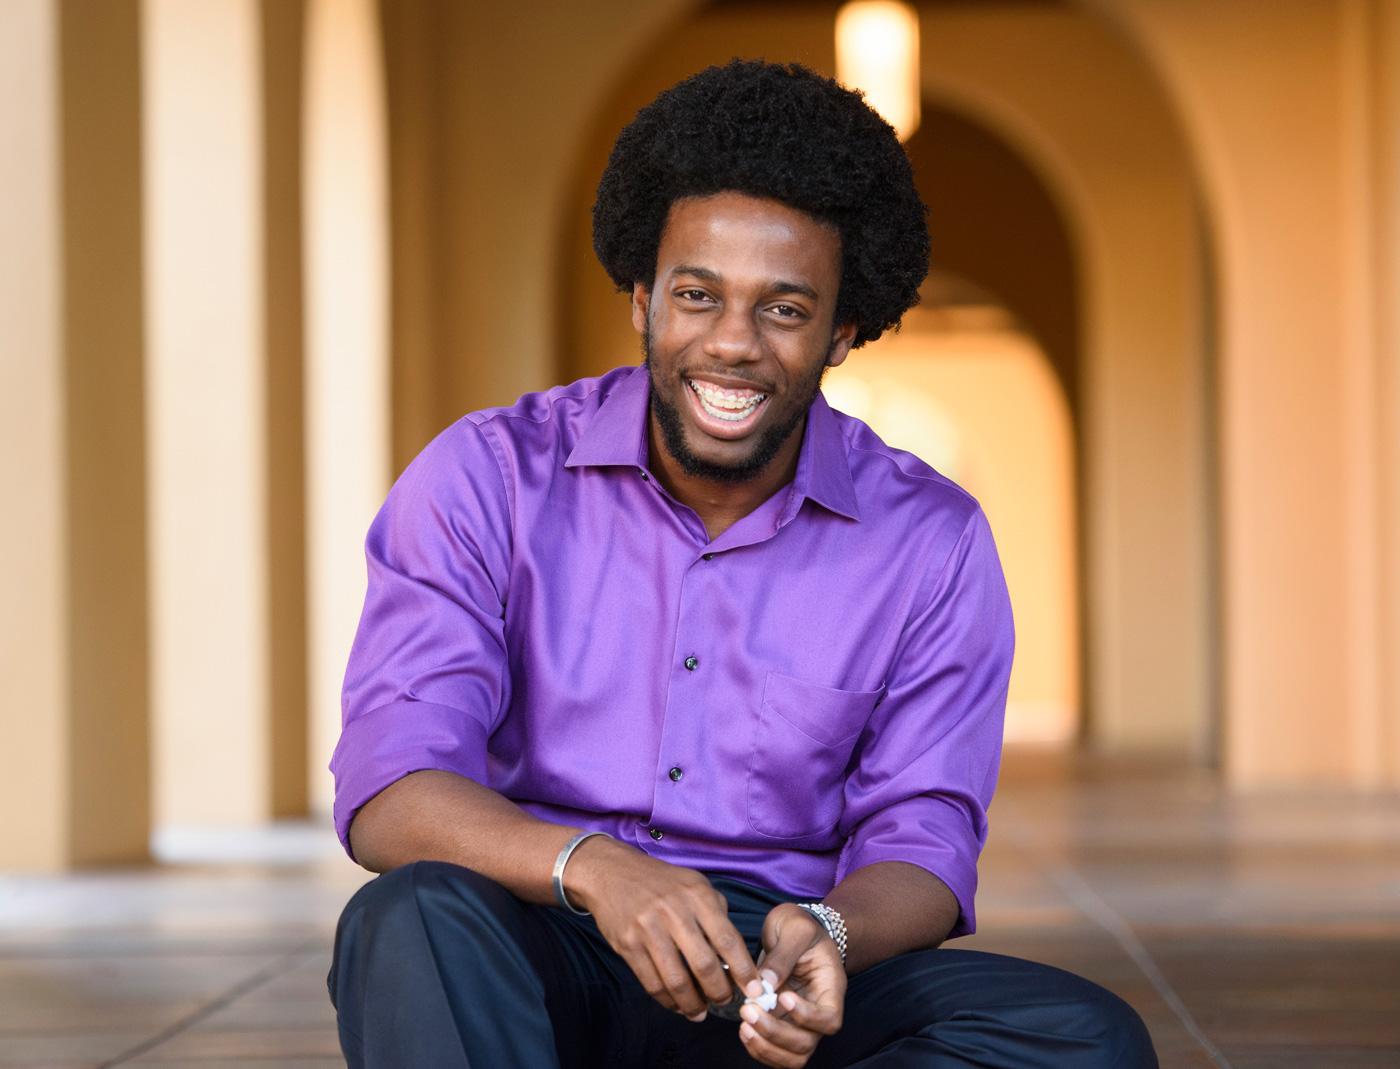 Meet Our Young Alum Rhodes Scholar